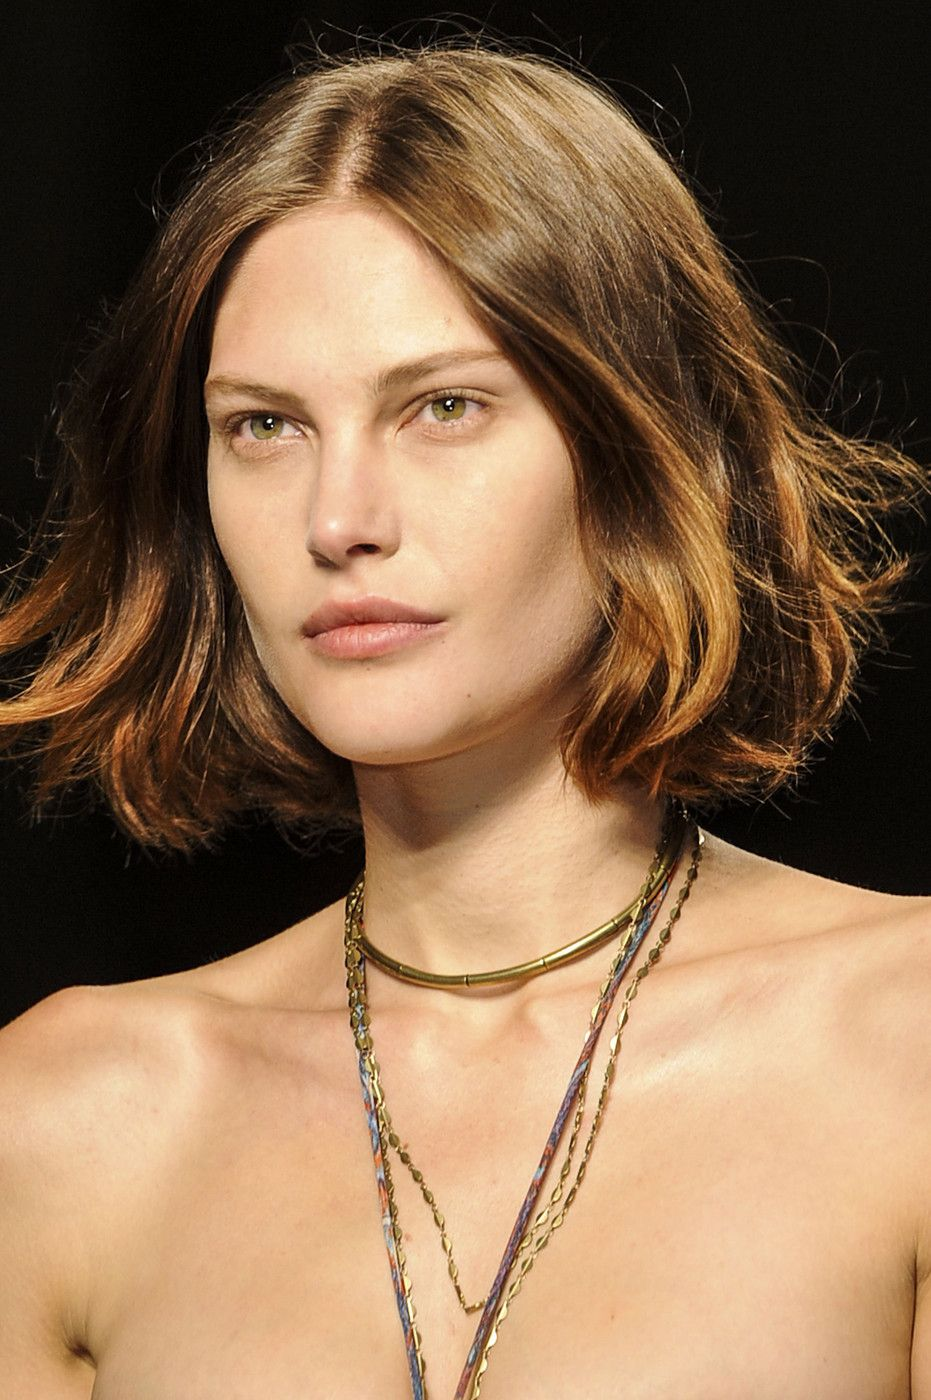 Isabel marant at paris fashion week spring catherine mcneil